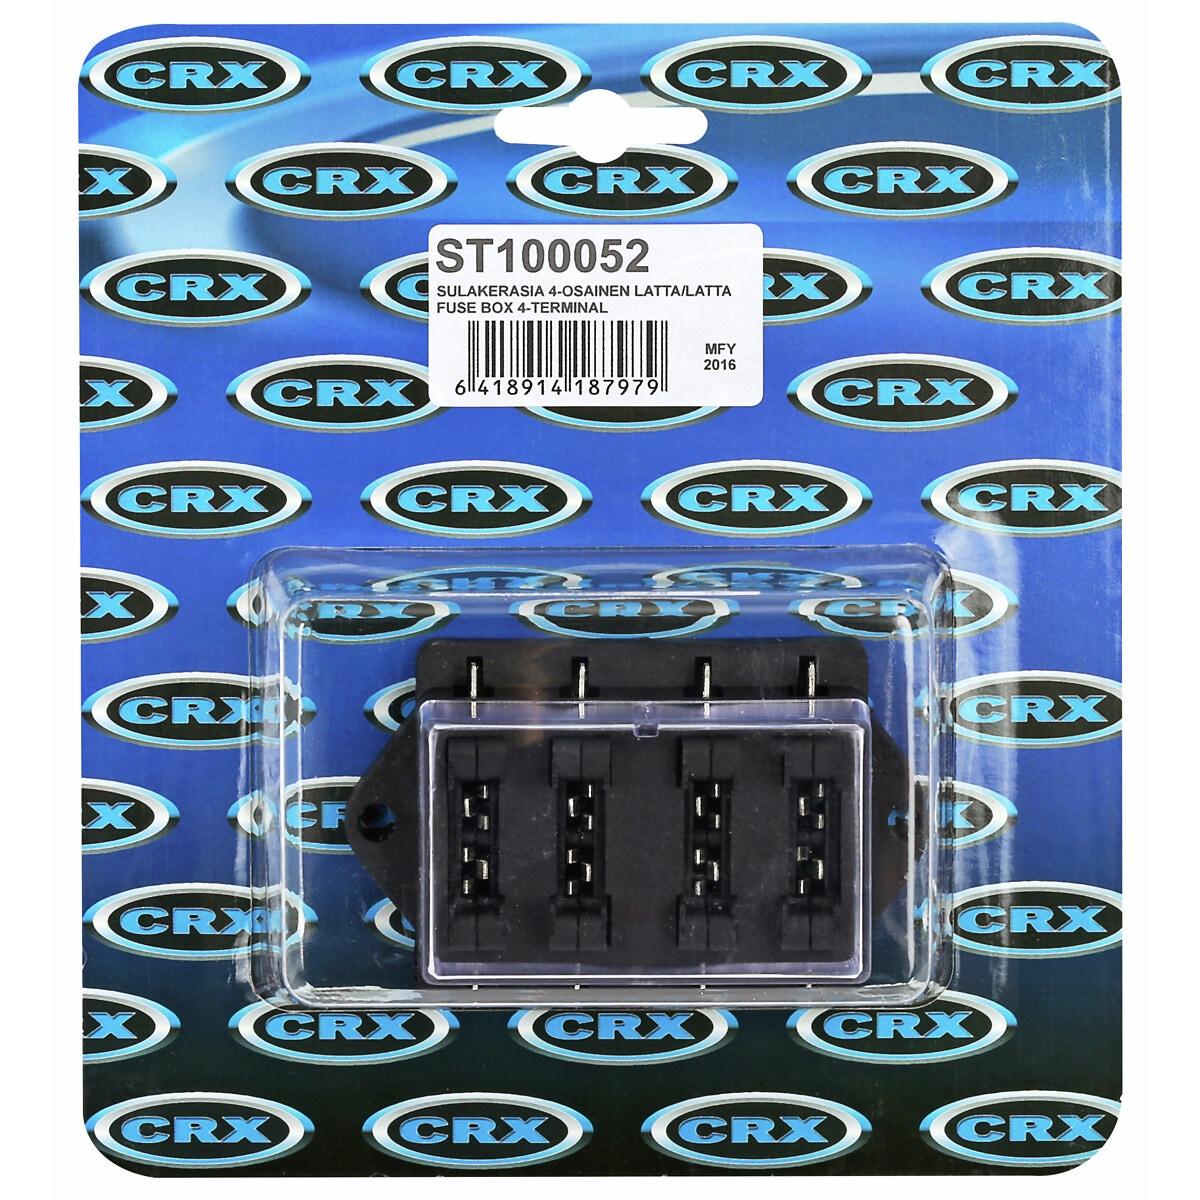 fuse box 4-terminal (st100052)